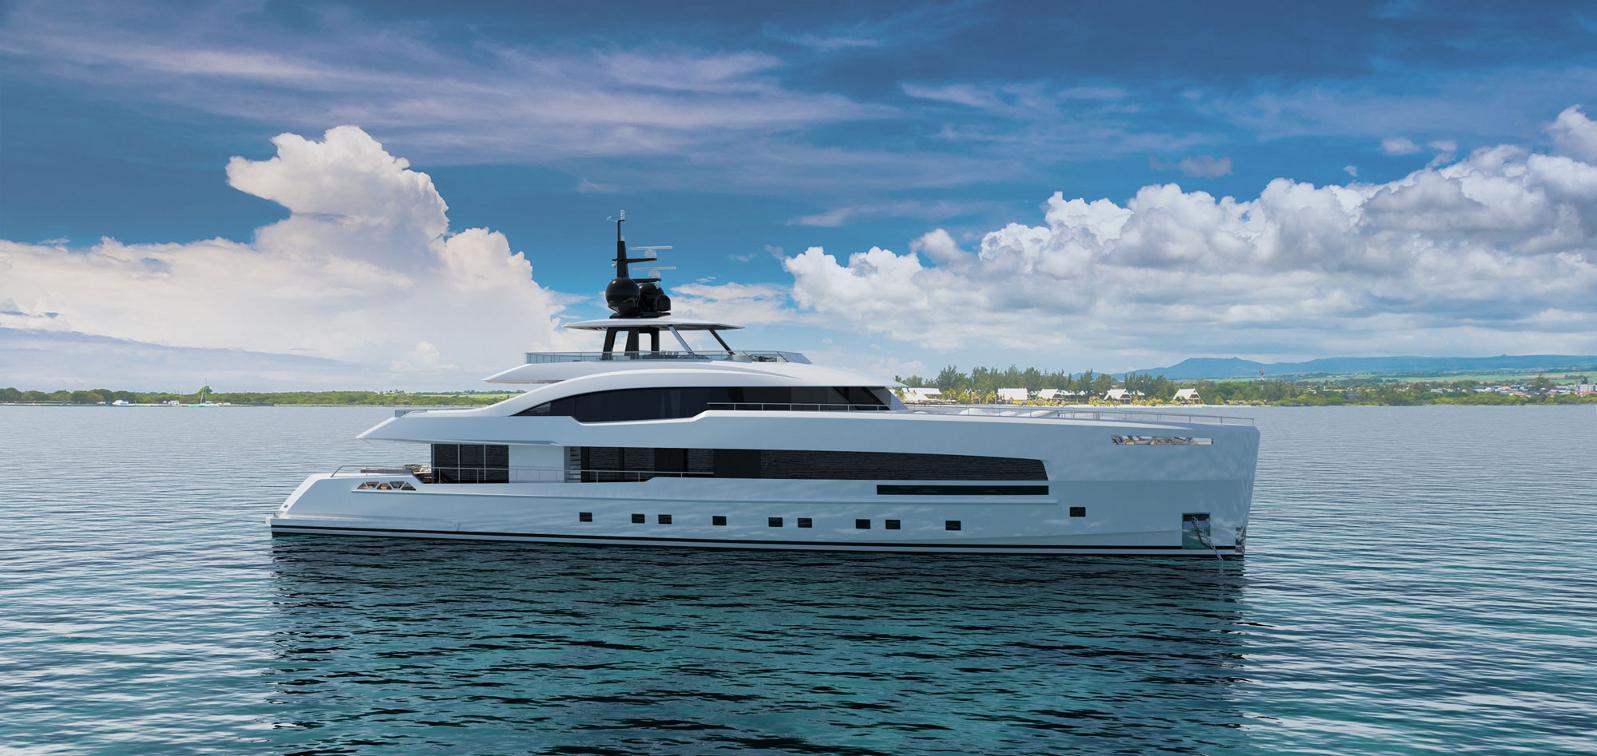 yara 44 displacement yacht by isa yachts